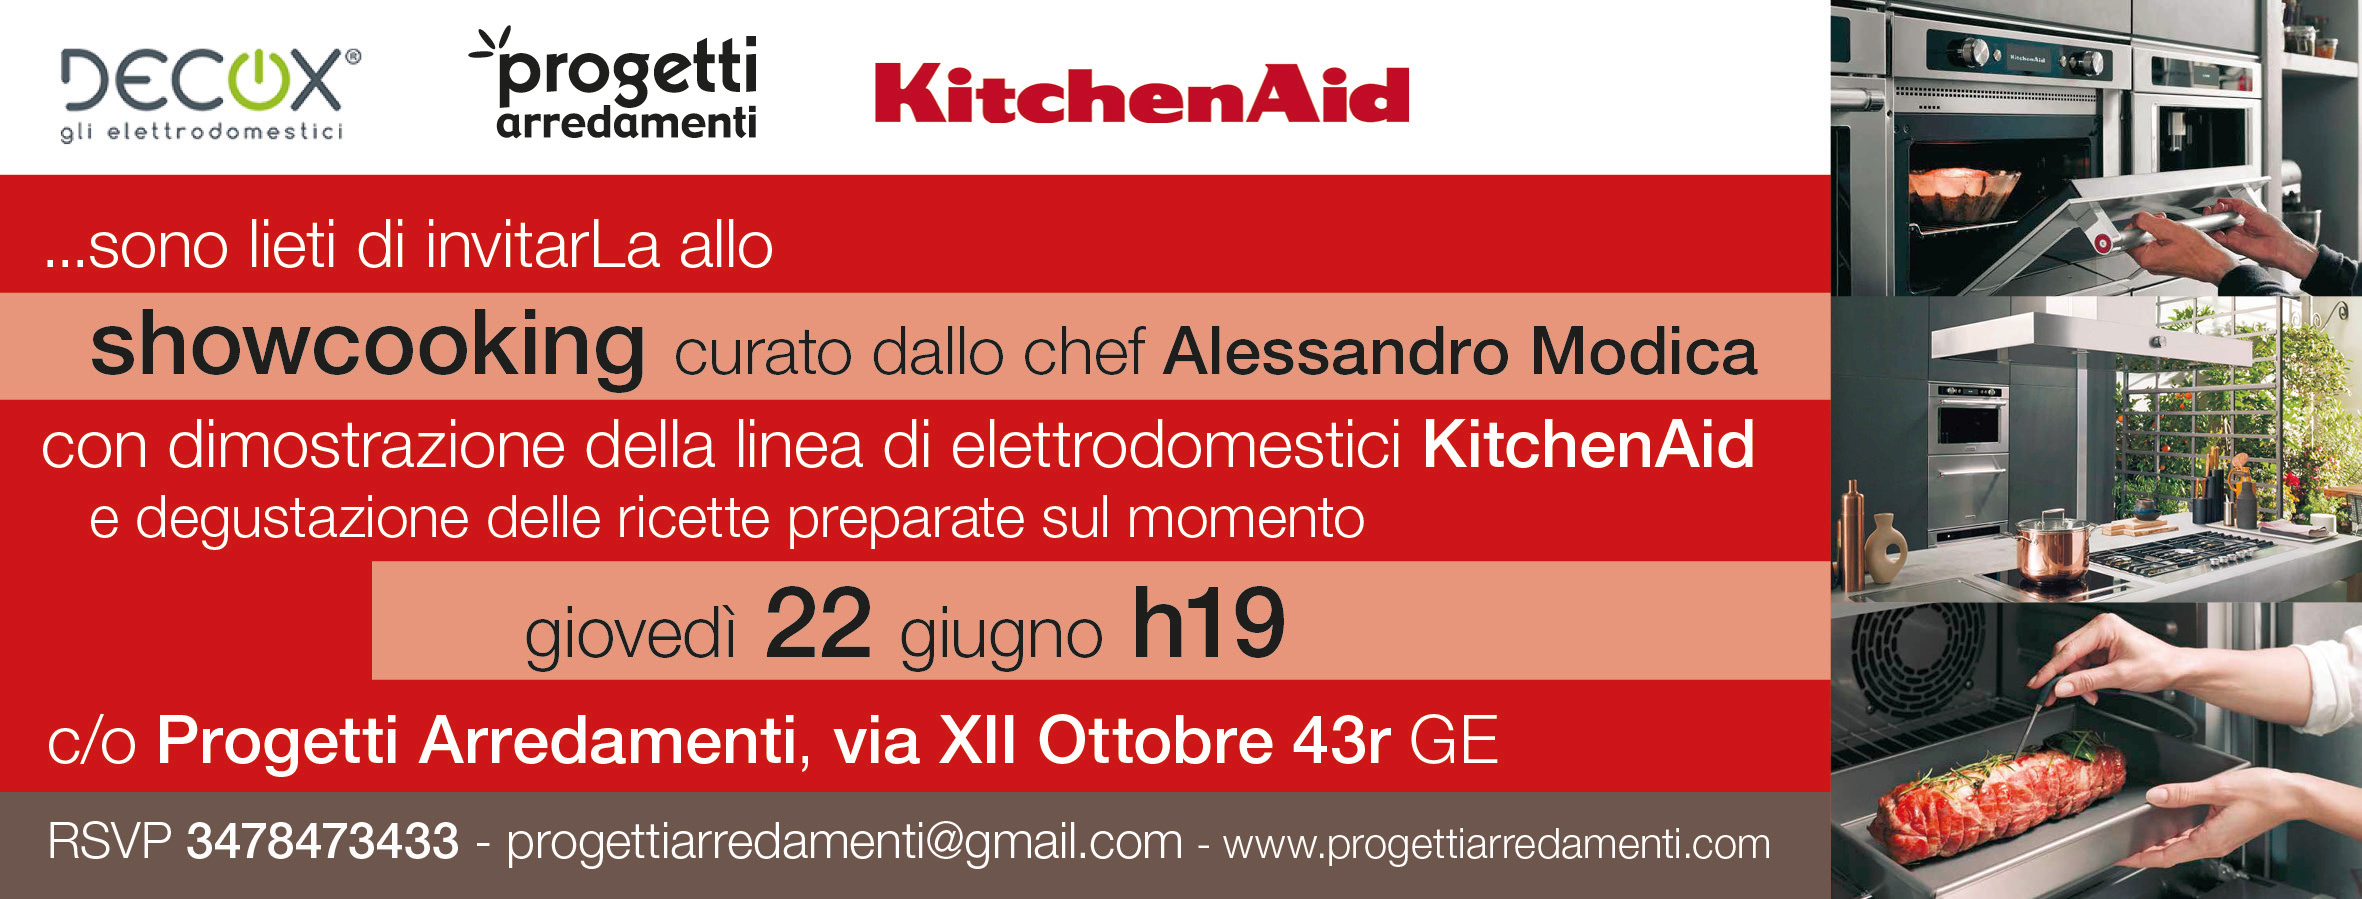 showcooking_kitchenaid_22-05-17